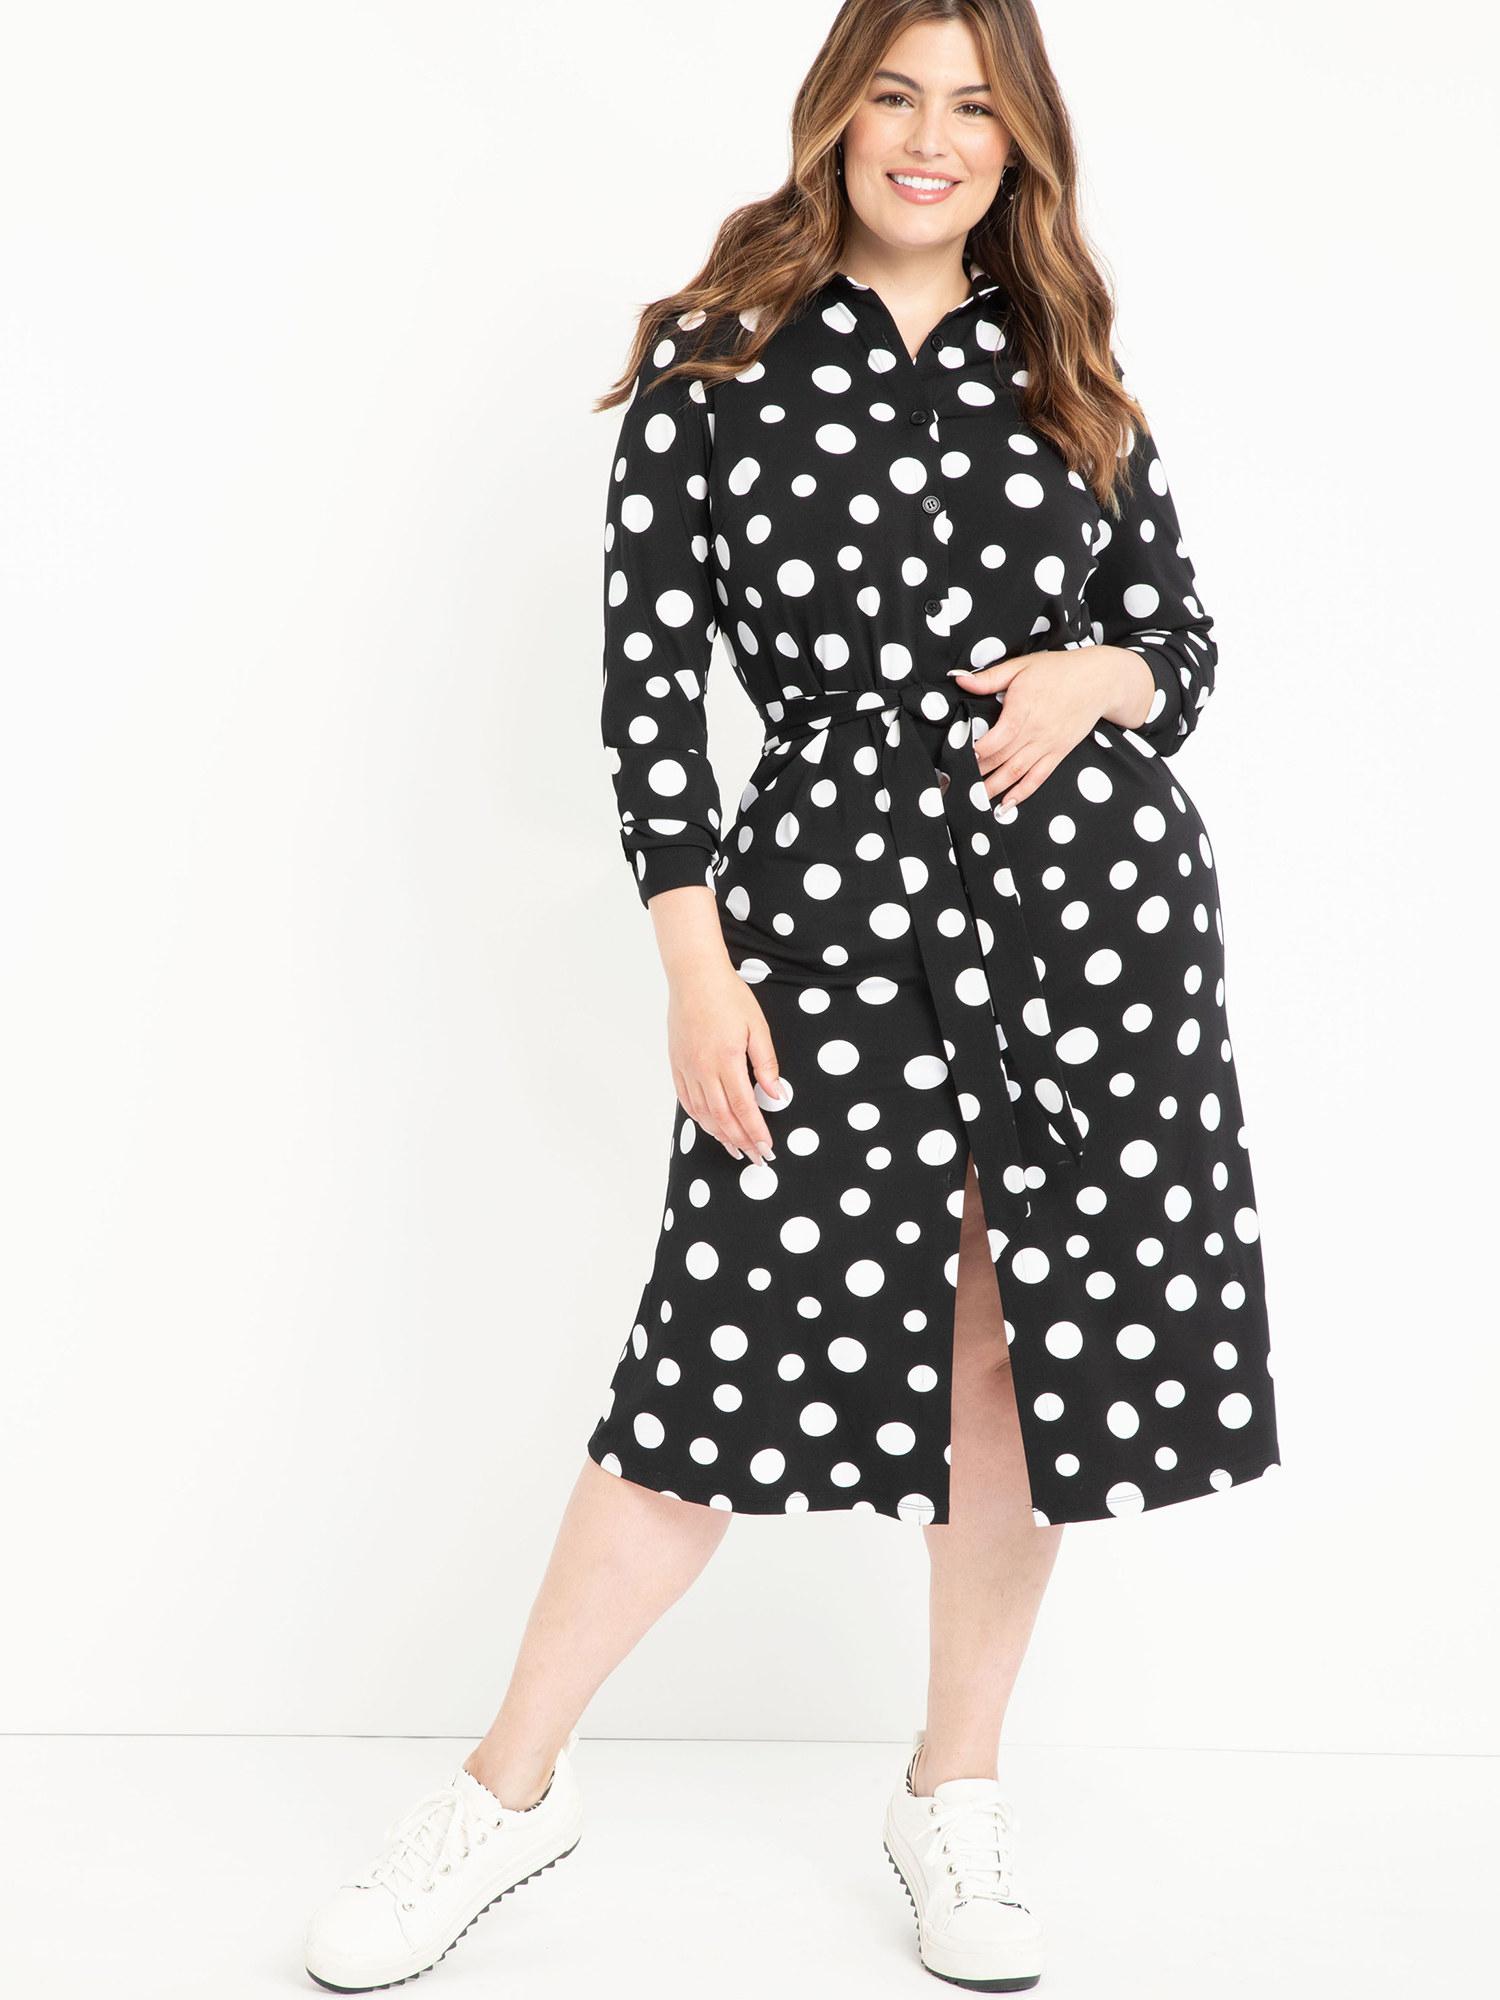 Woman in a polka-dot dress